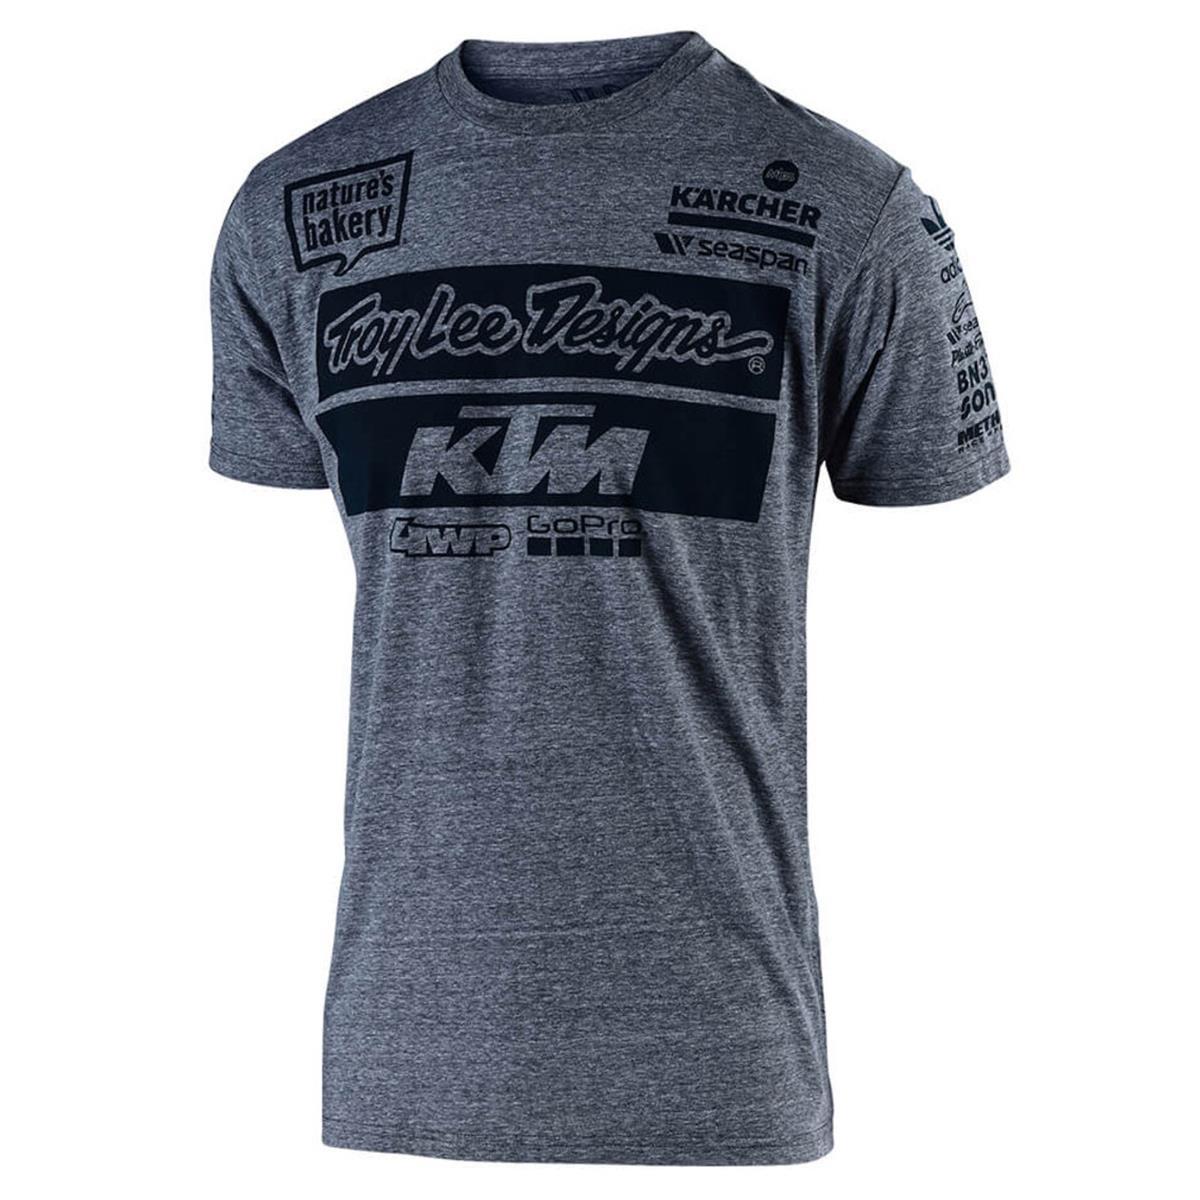 Troy Lee Designs Kids T-Shirt KTM Team Charcoal Heather